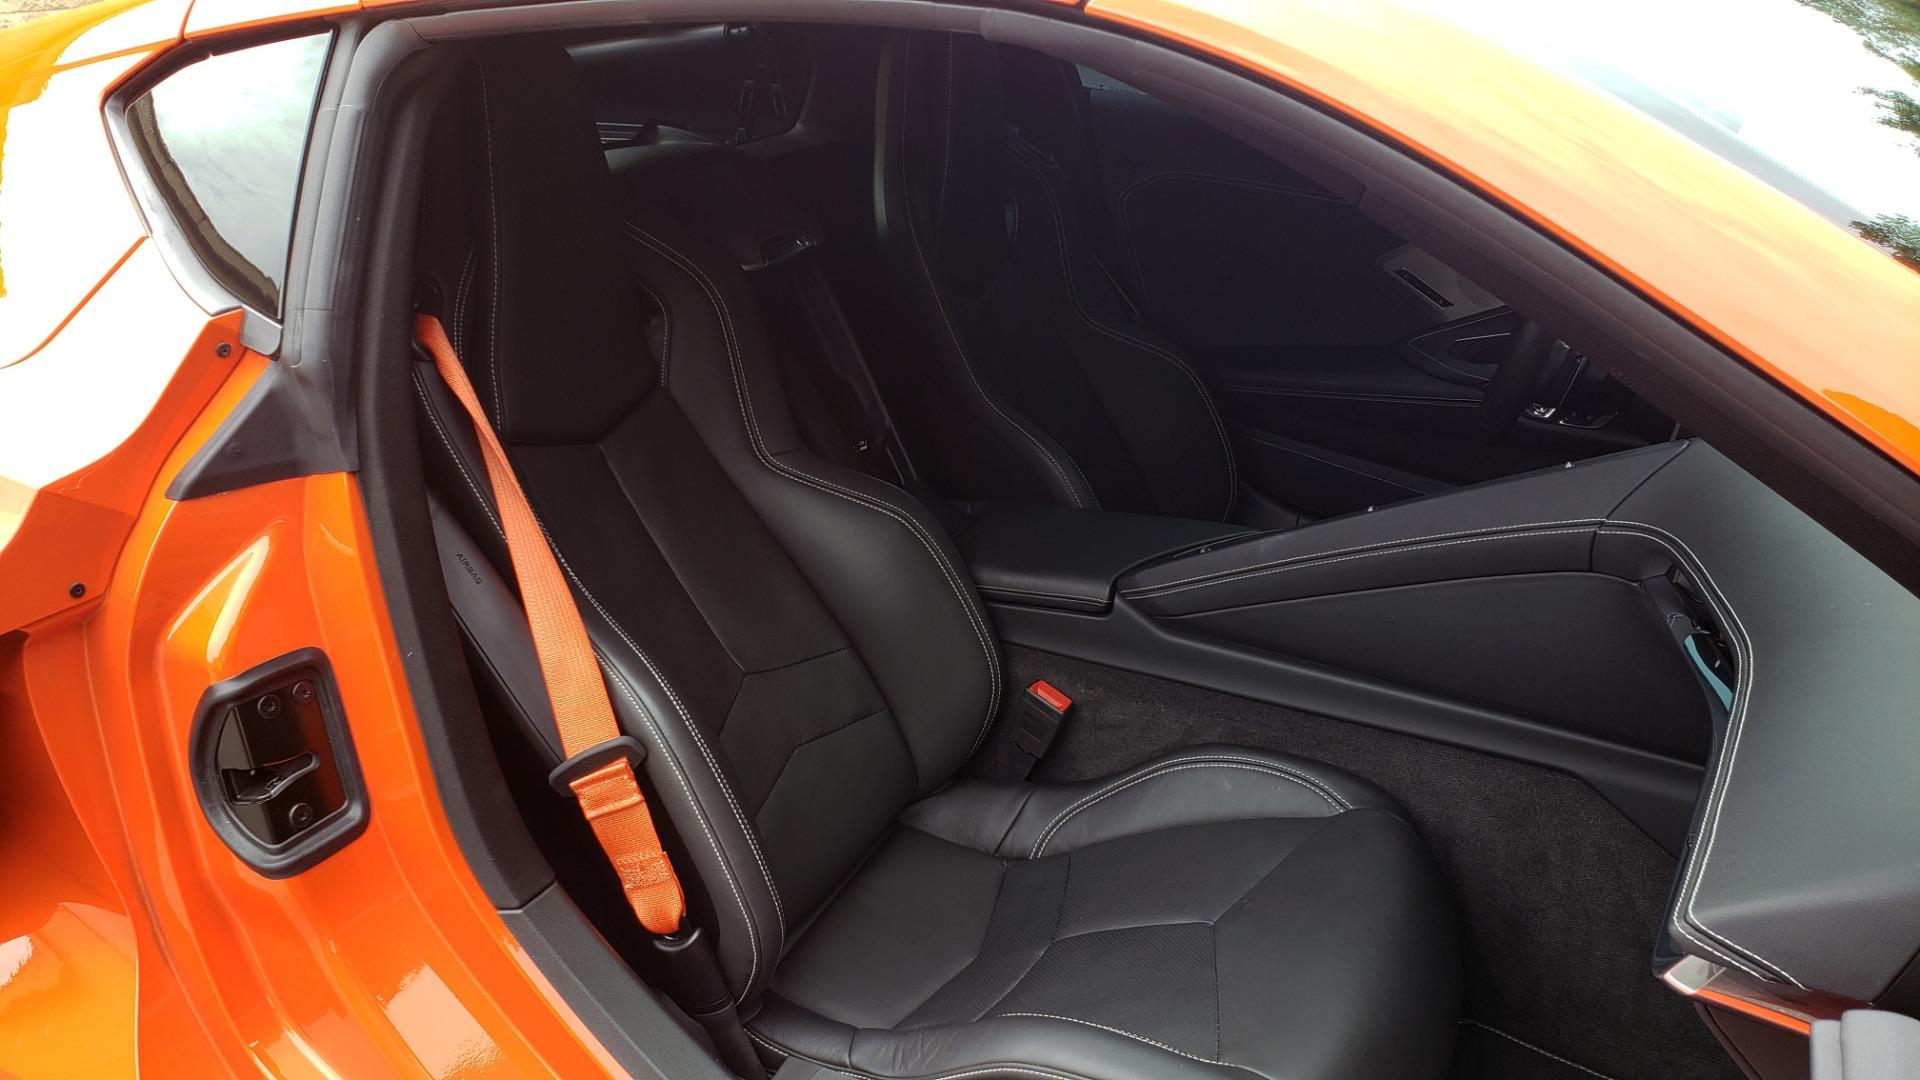 Used 2020 Chevrolet CORVETTE C8 STINGRAY 2LT / 6.2L V8 / 8-SPD AUTO / NAV / BOSE / REARVIEW / DATA RECOR for sale Sold at Formula Imports in Charlotte NC 28227 65